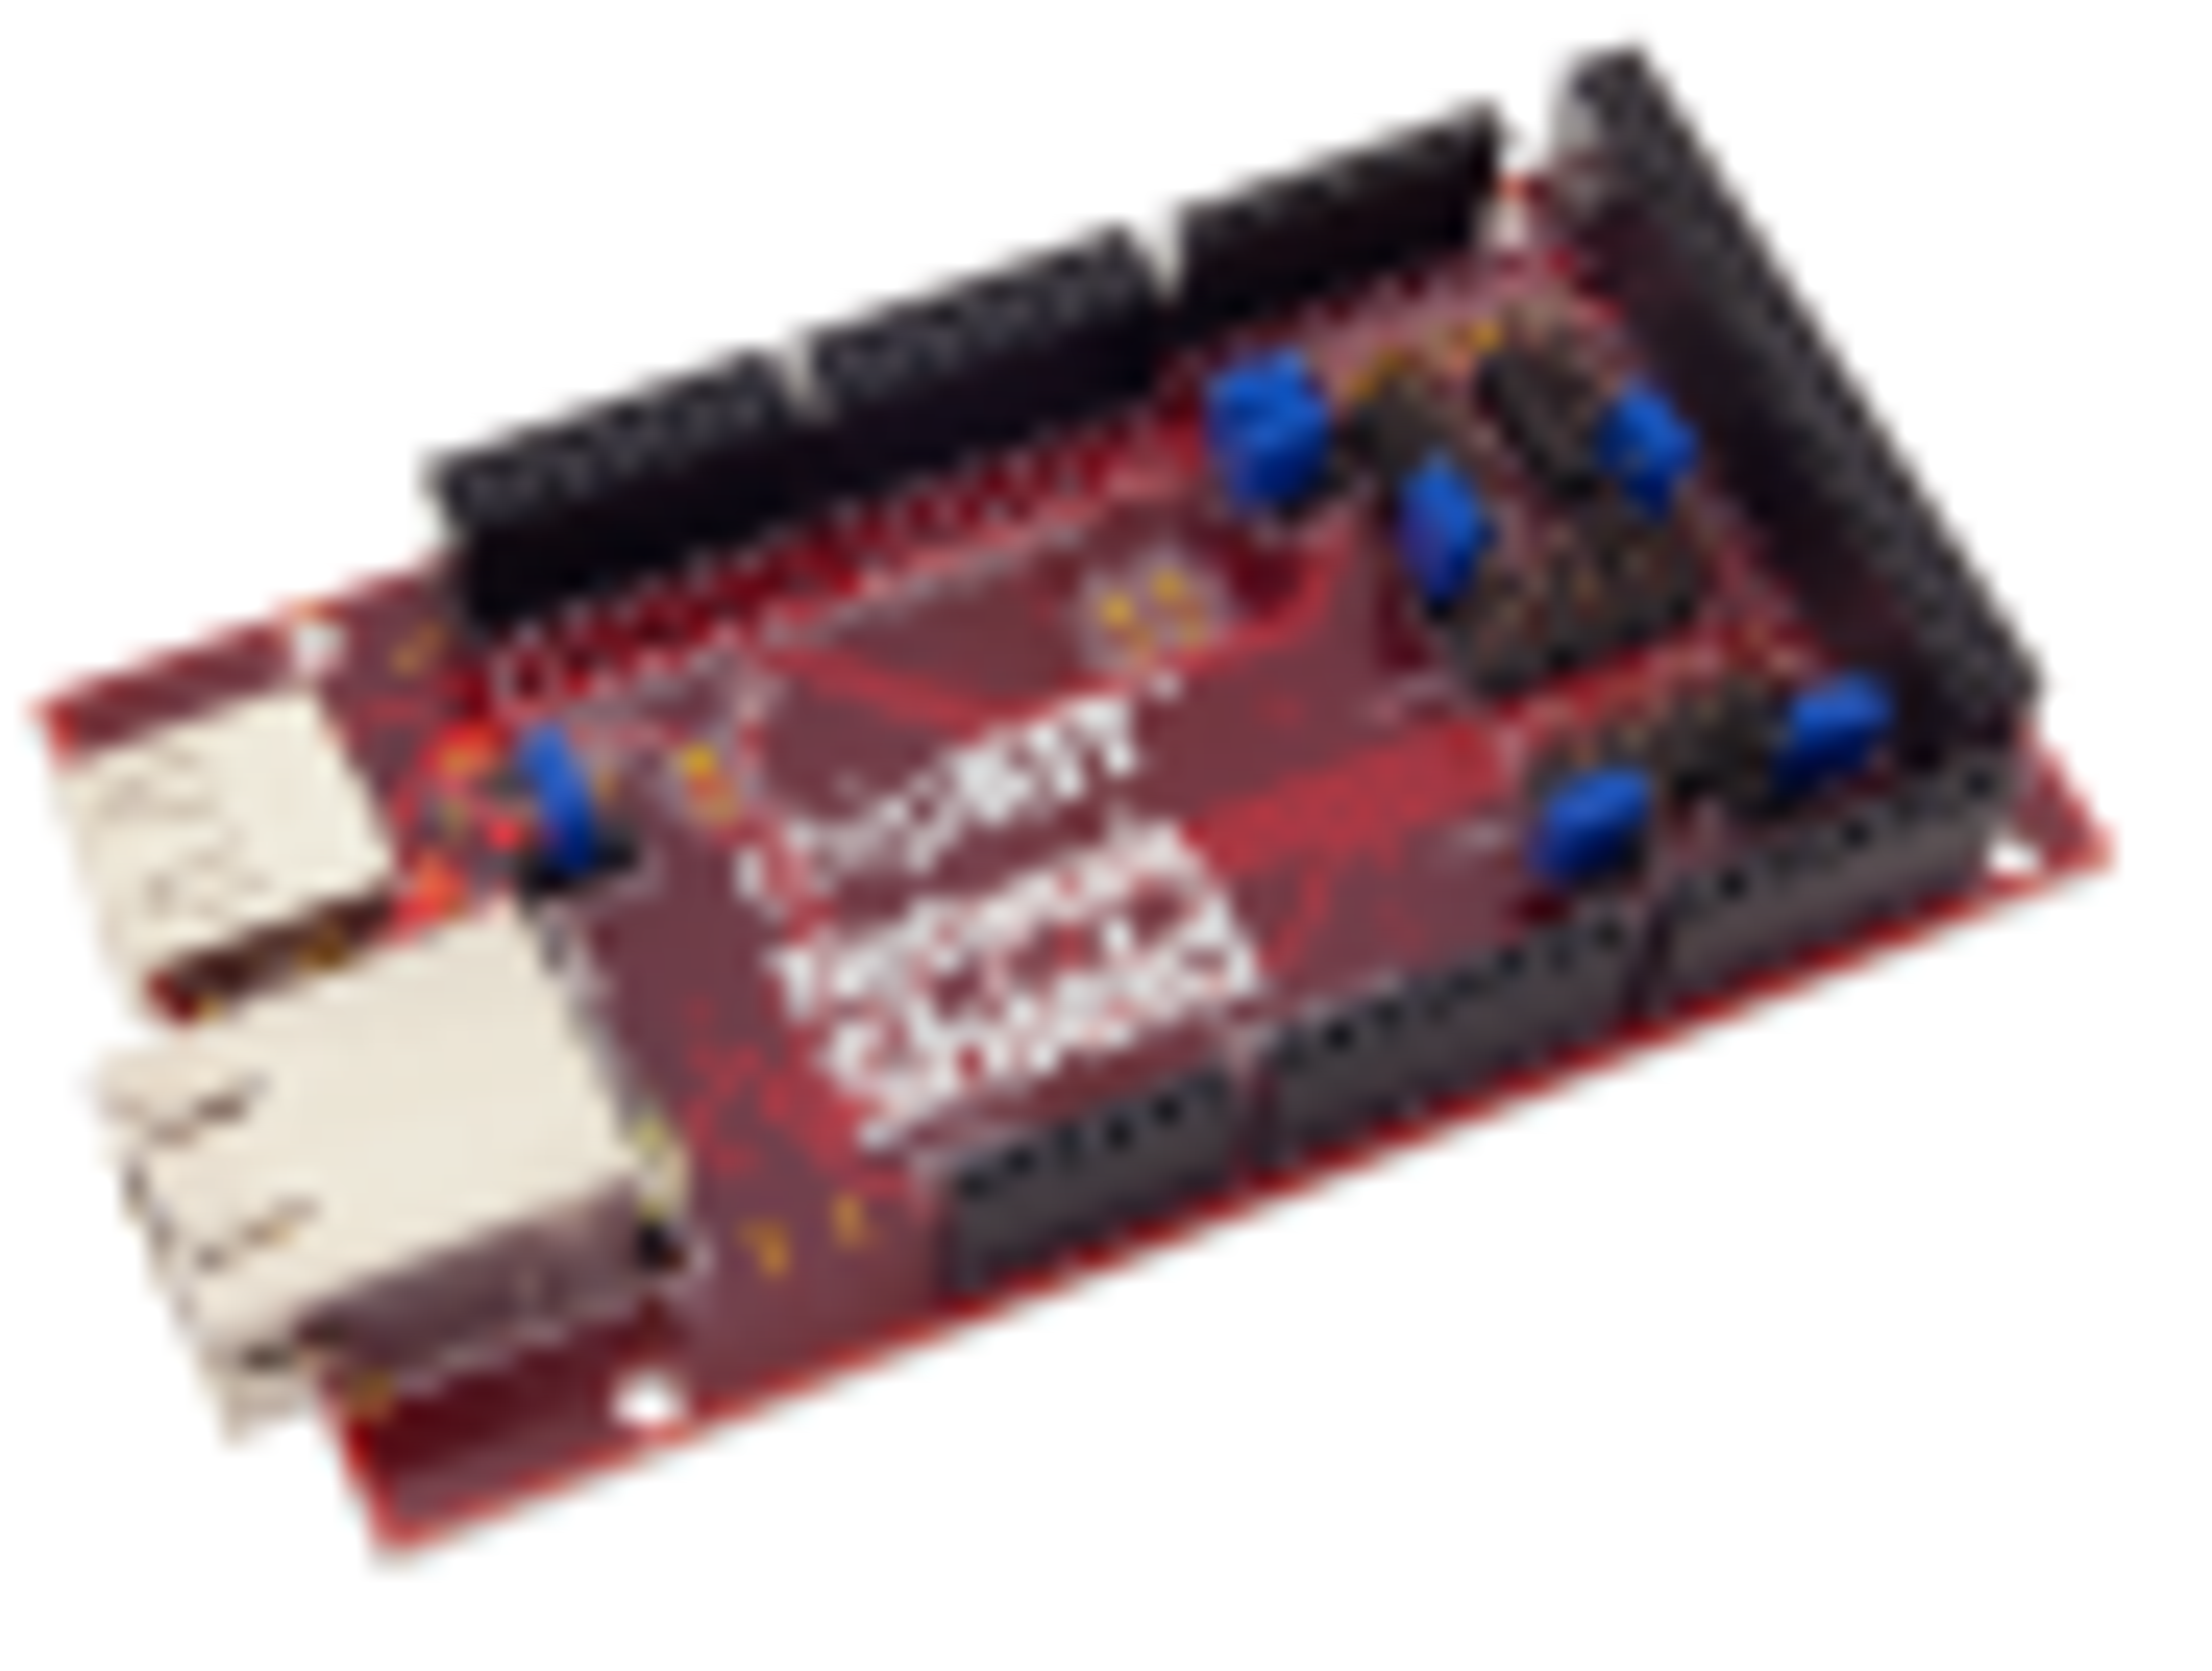 chipkit_shield_network:chipkit-networkshield-obl-2400.png